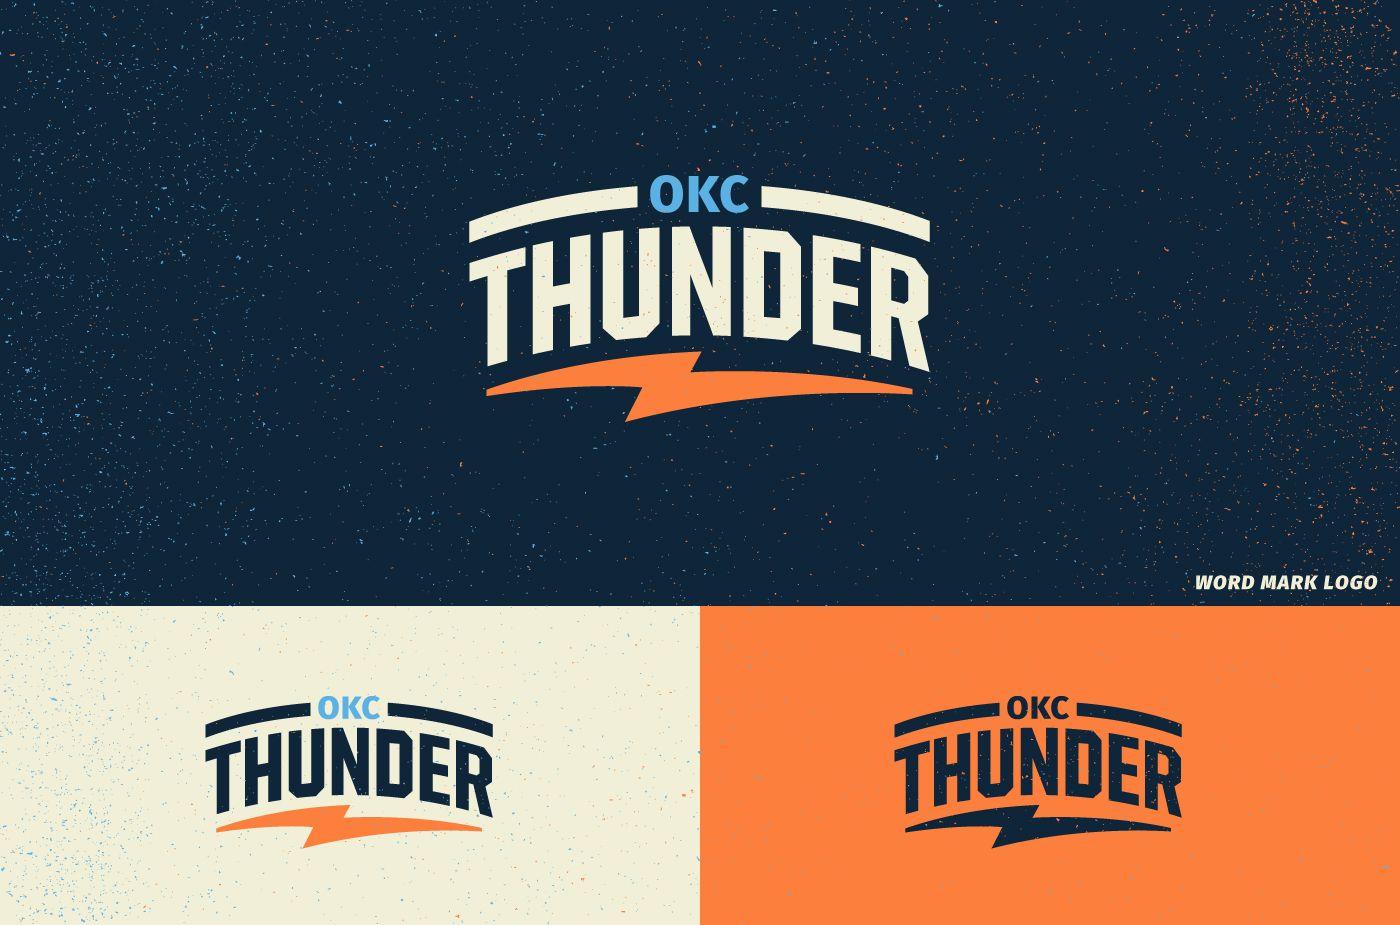 Concept for a new Oklahoma City Thunder brand identity